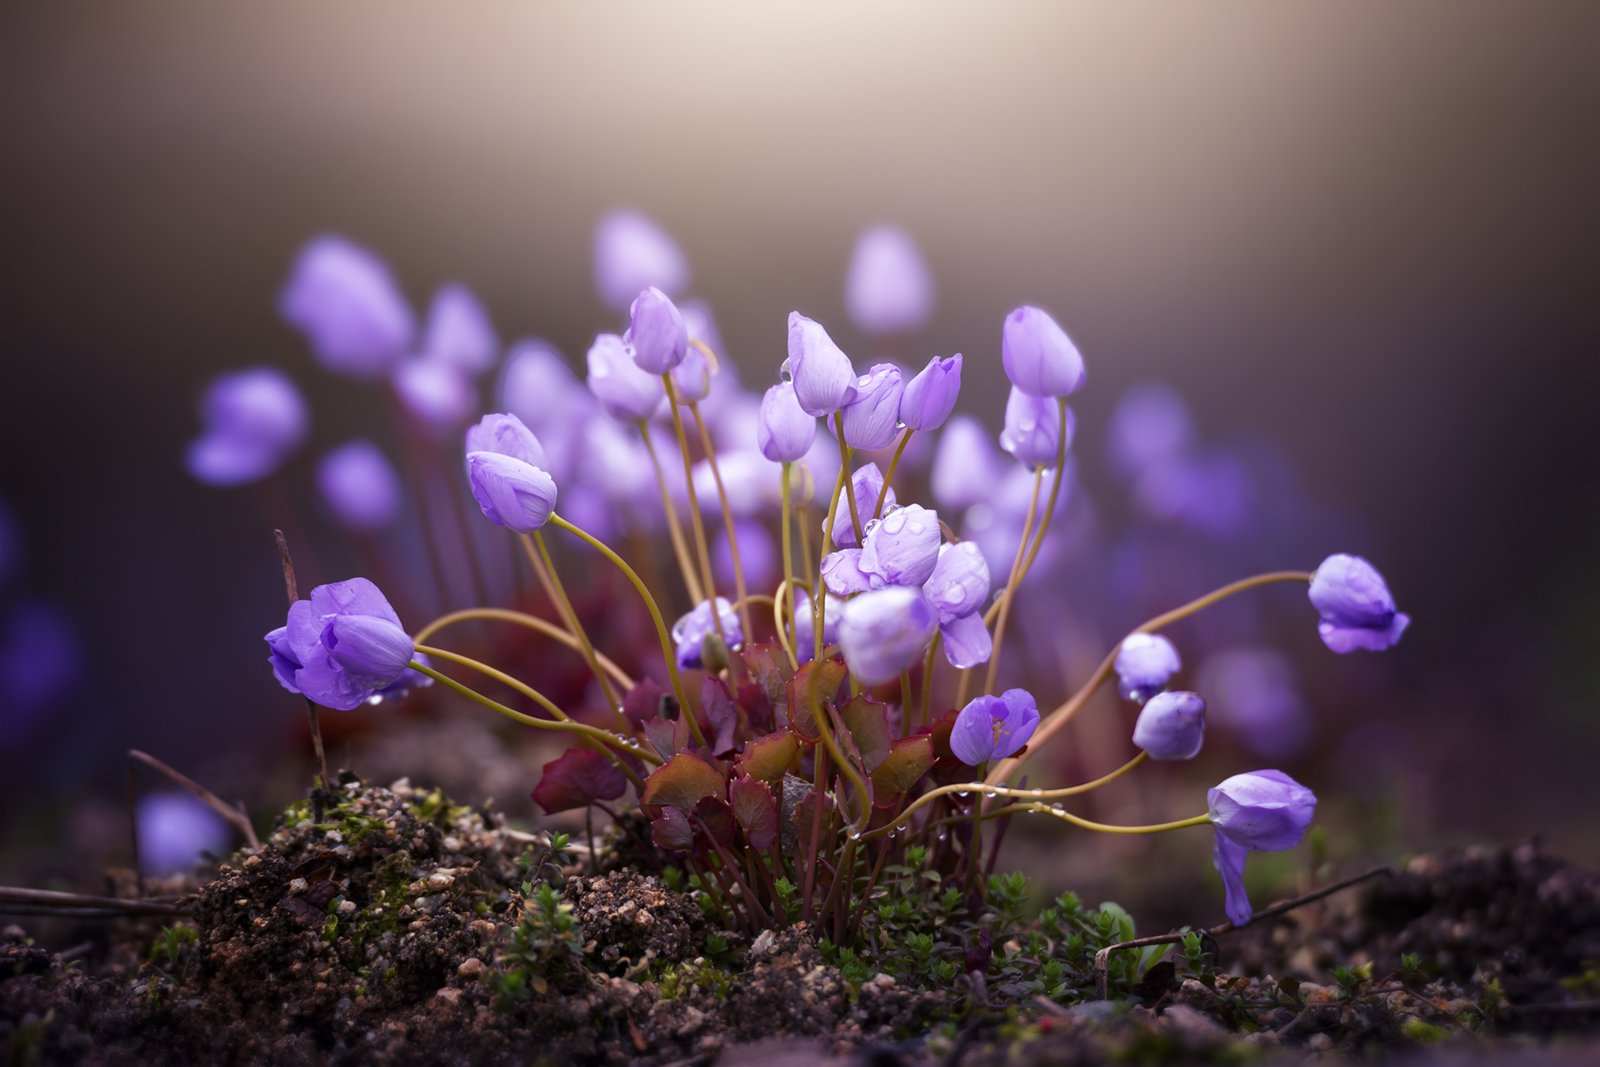 flower purple light blossom rain rainy morning spring , Tiger Seo